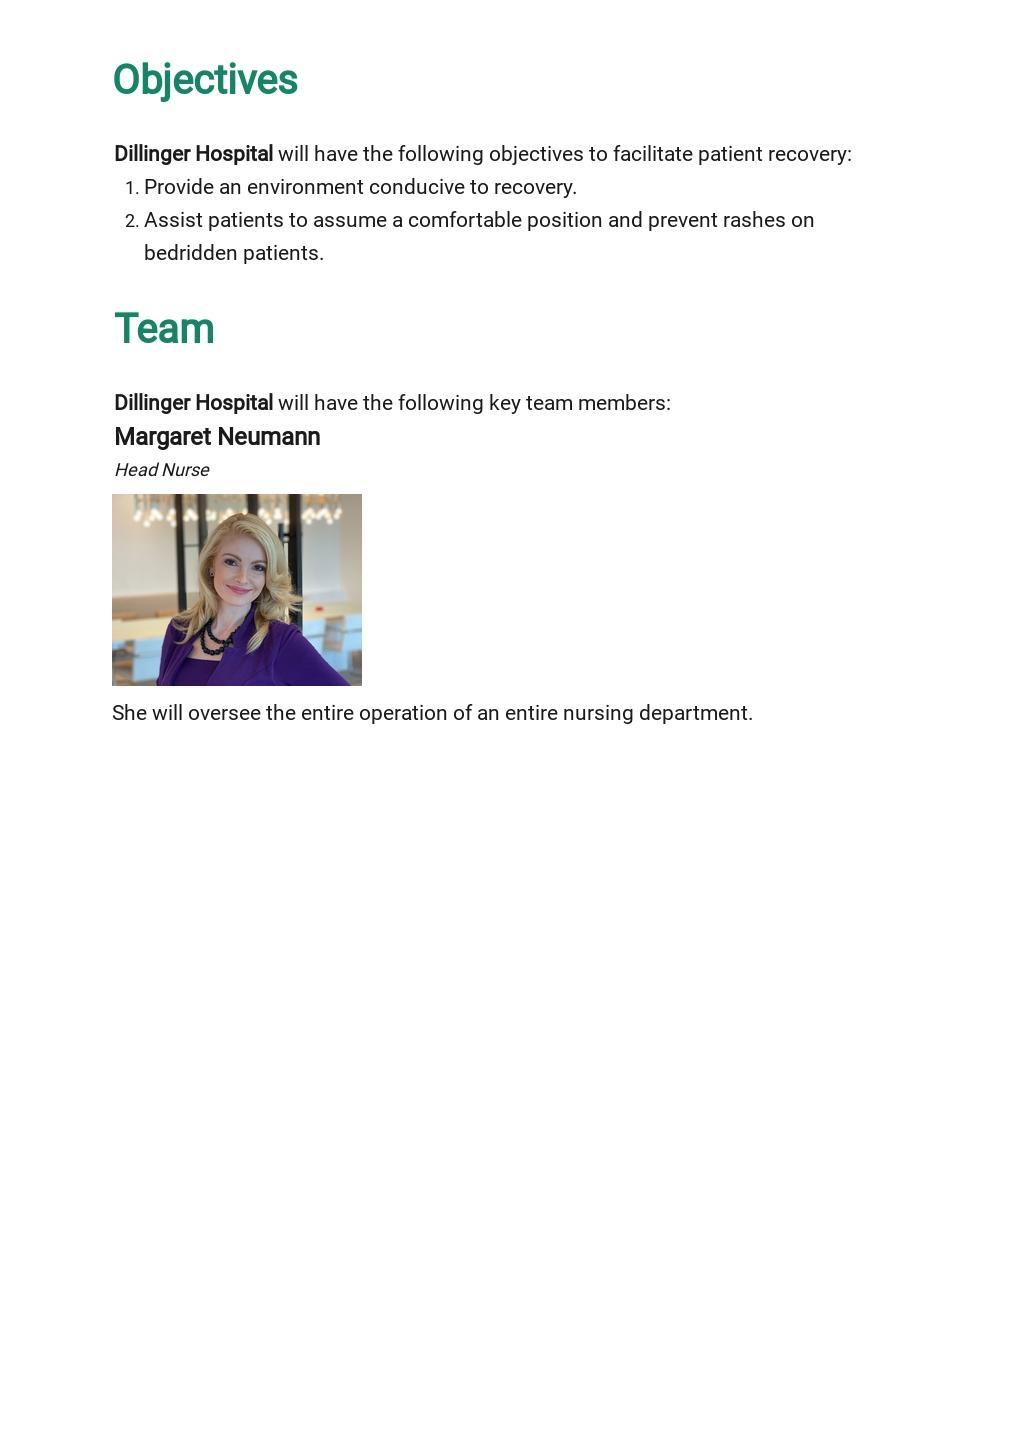 Blank Nursing Care Plan Template [Free PDF] - Google Docs, Word, Apple Pages, PDF